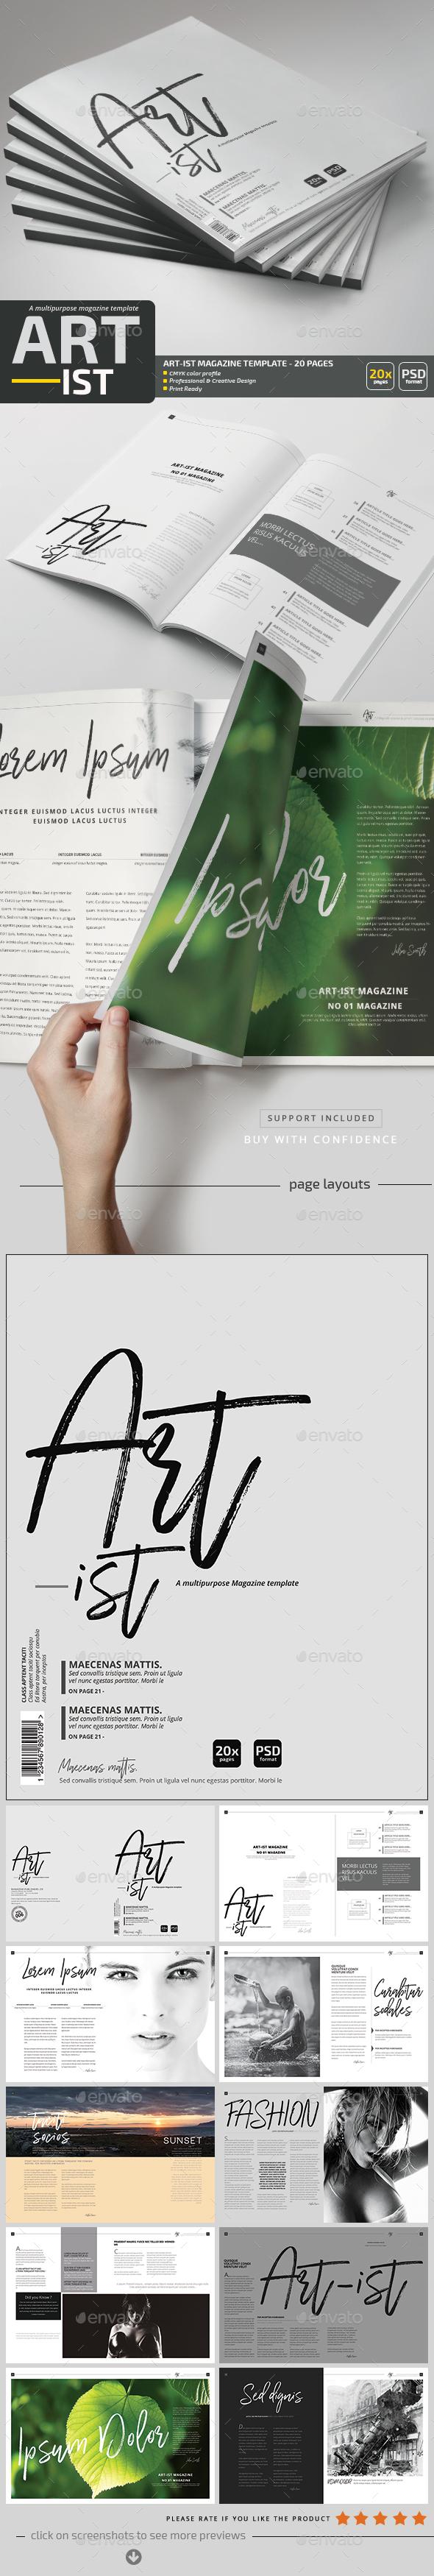 Art-ist Magazine Template V.6 - Magazines Print Templates